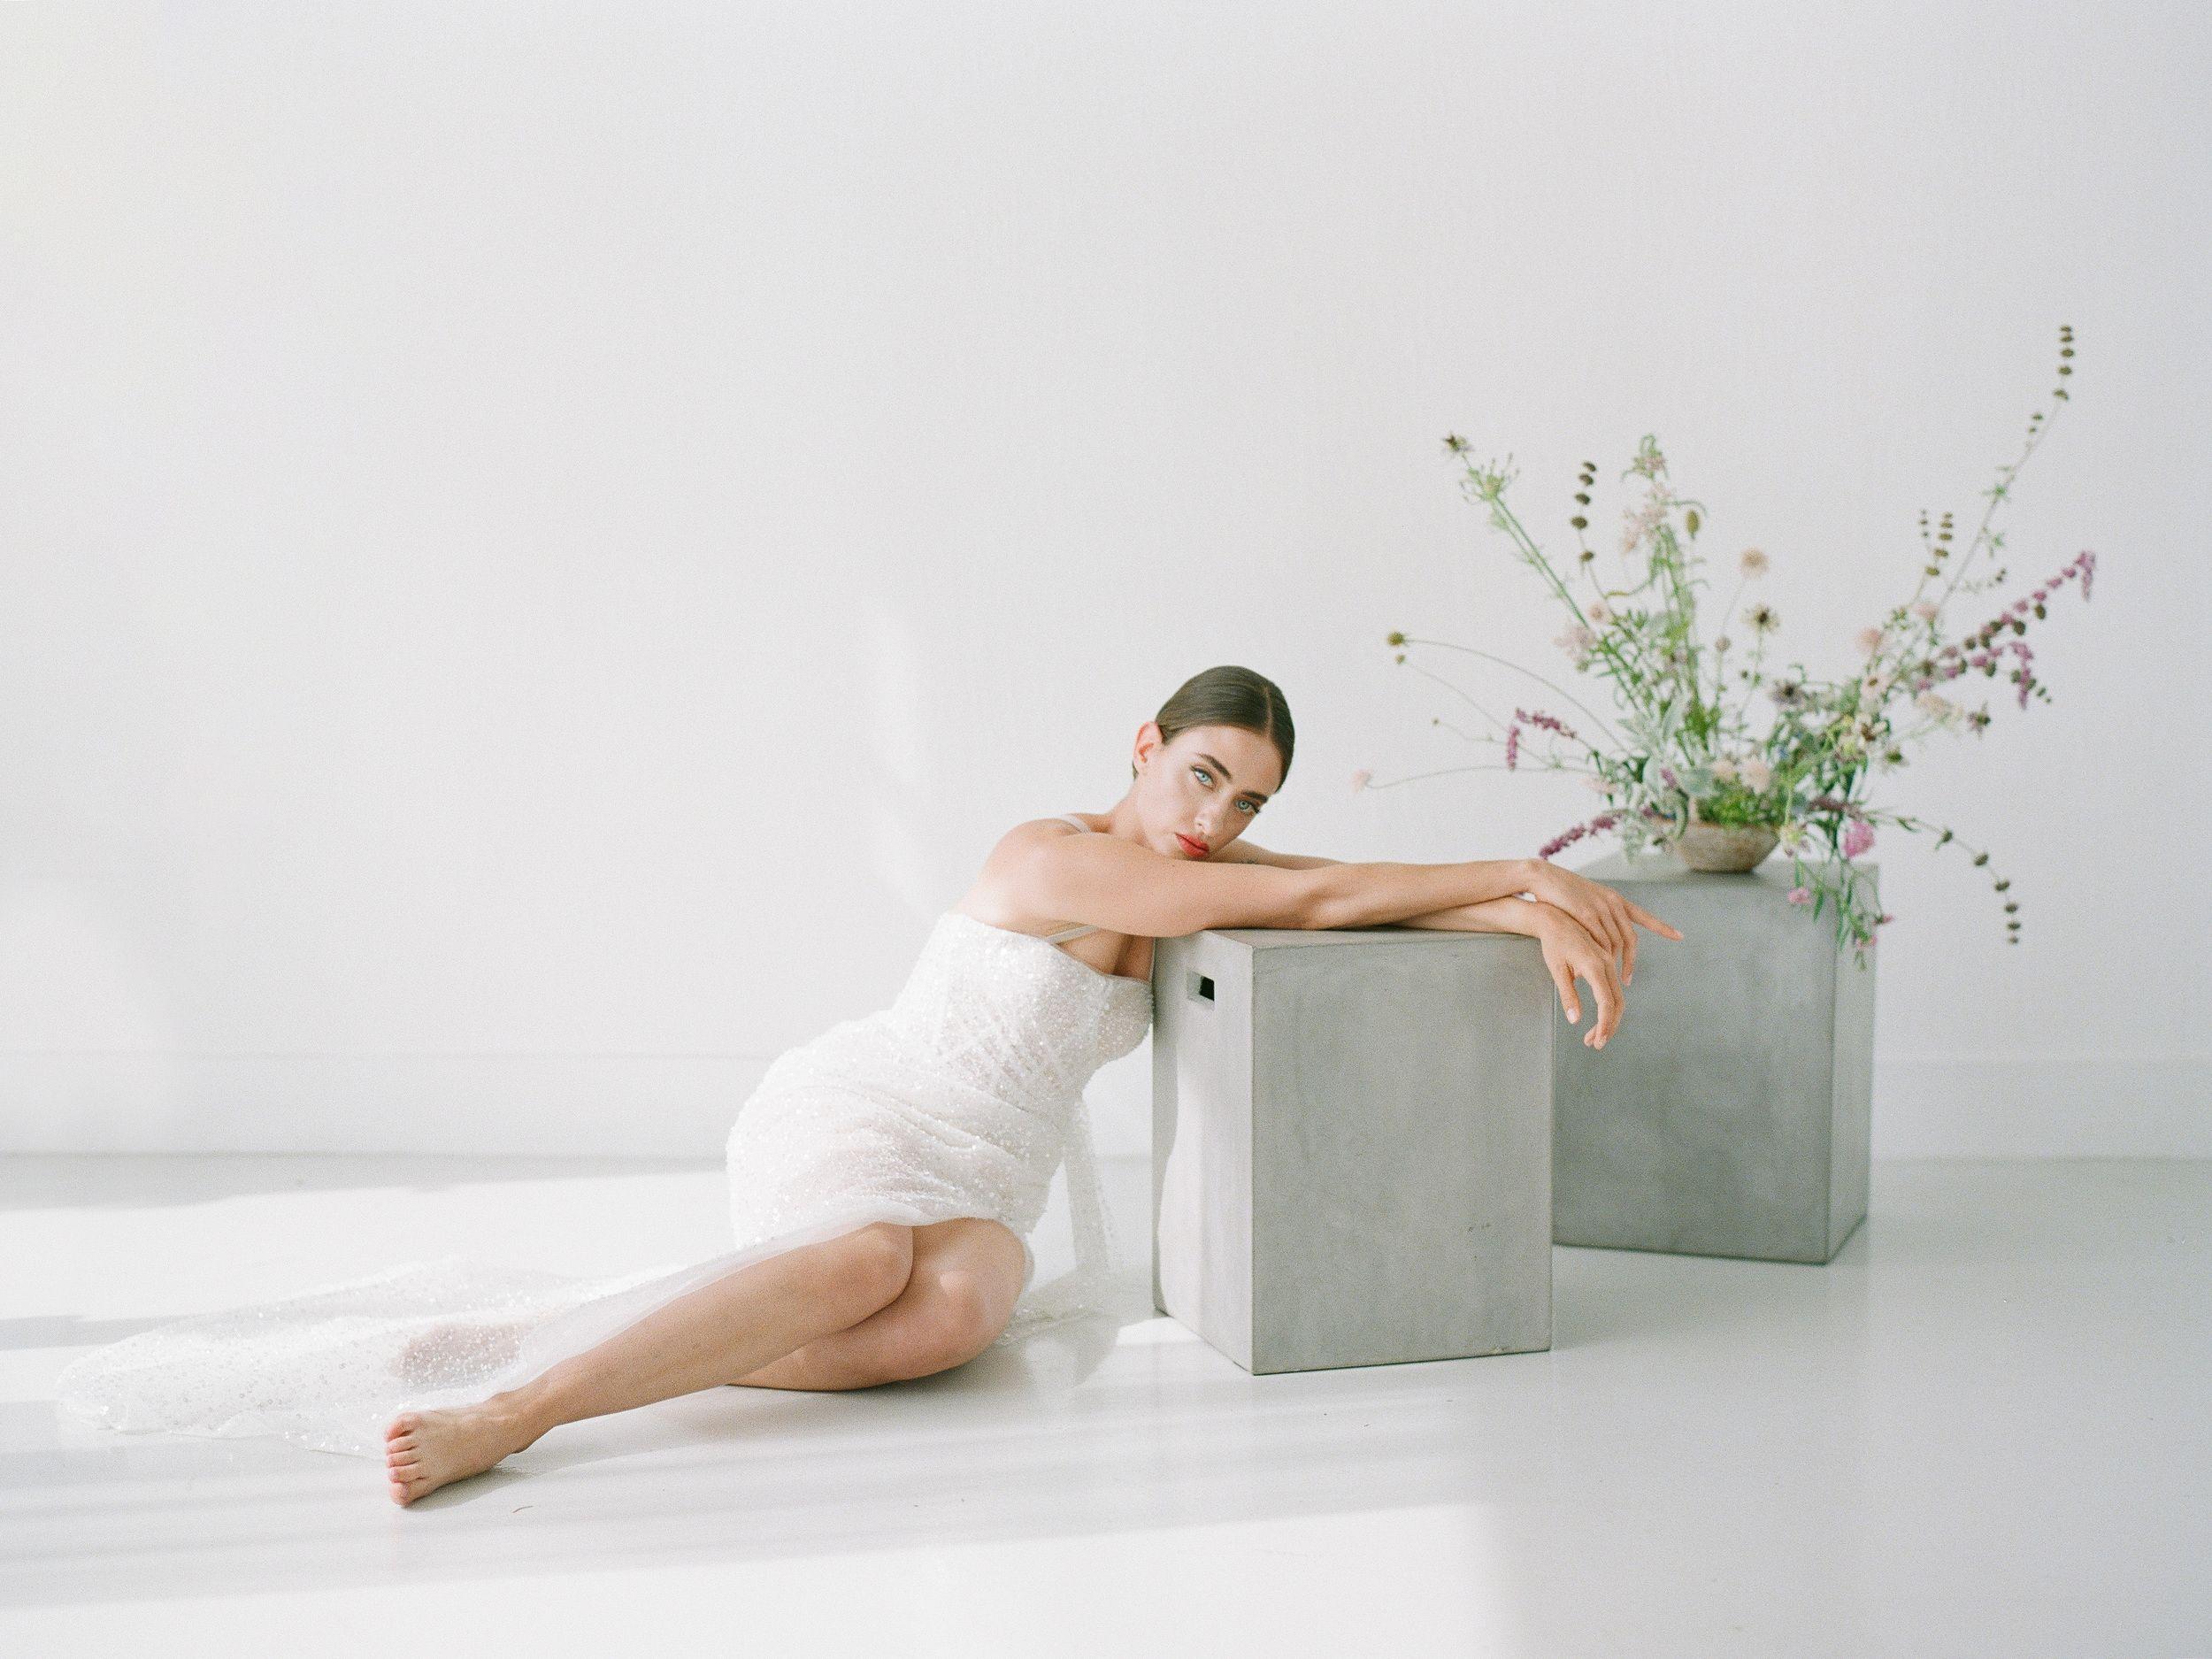 portrait, analogue, film, contax645, kodak, richardphotolab, fashion, minimal, Boseva Radostina